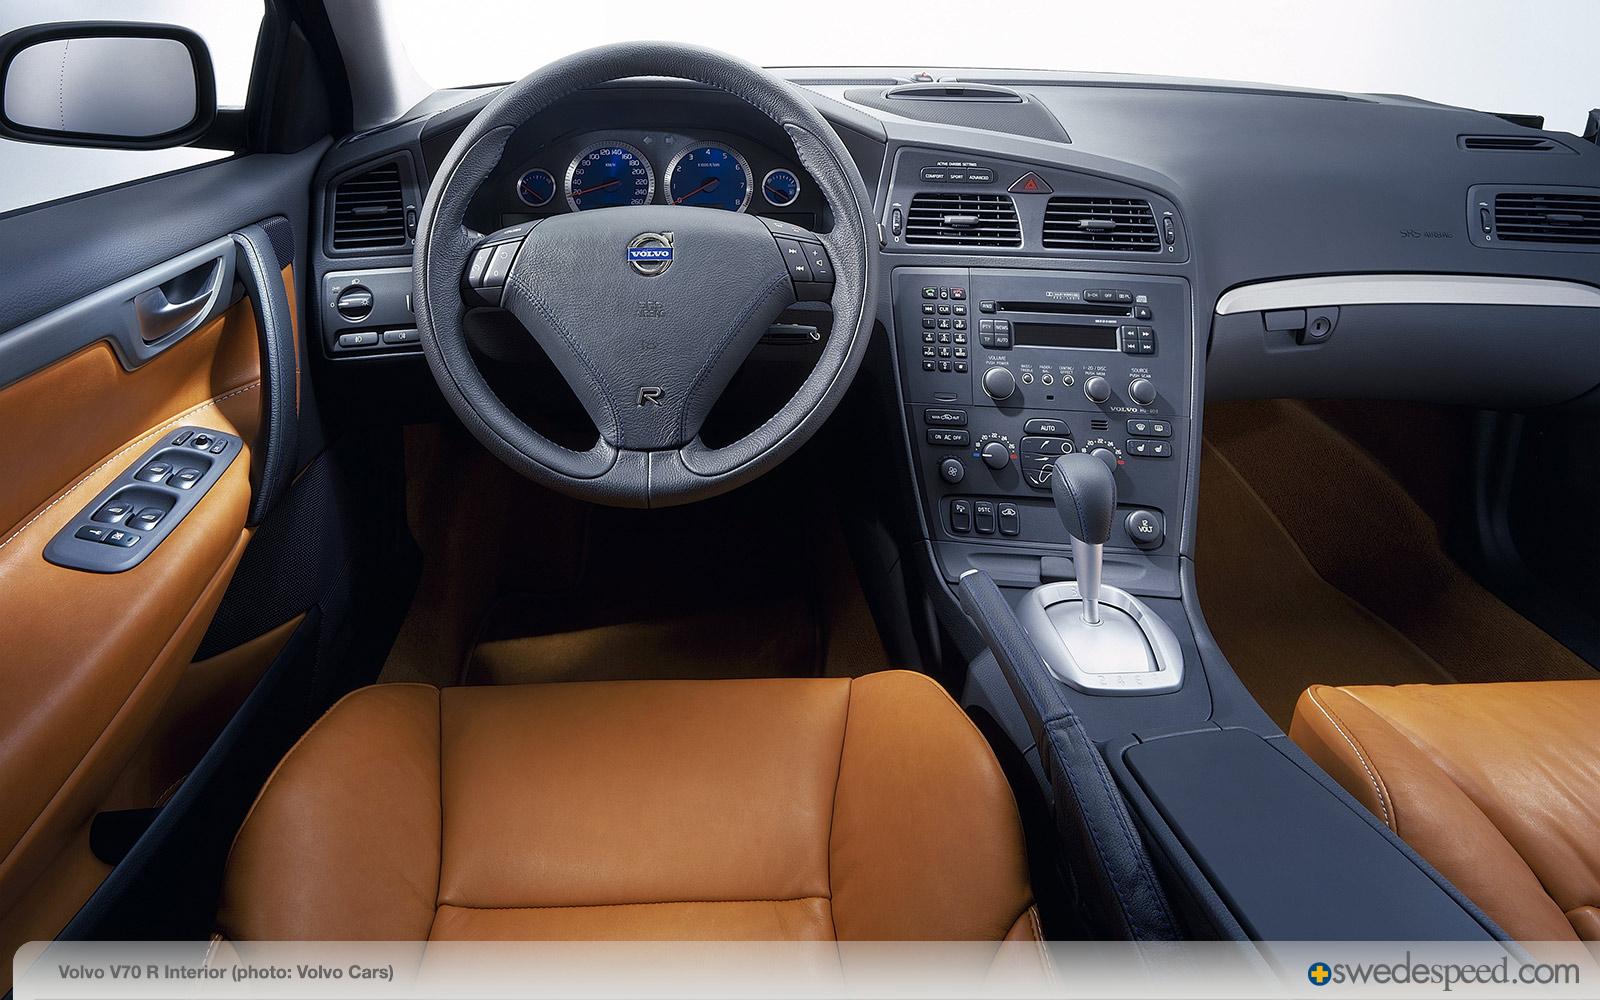 Volvo V70 R Interior